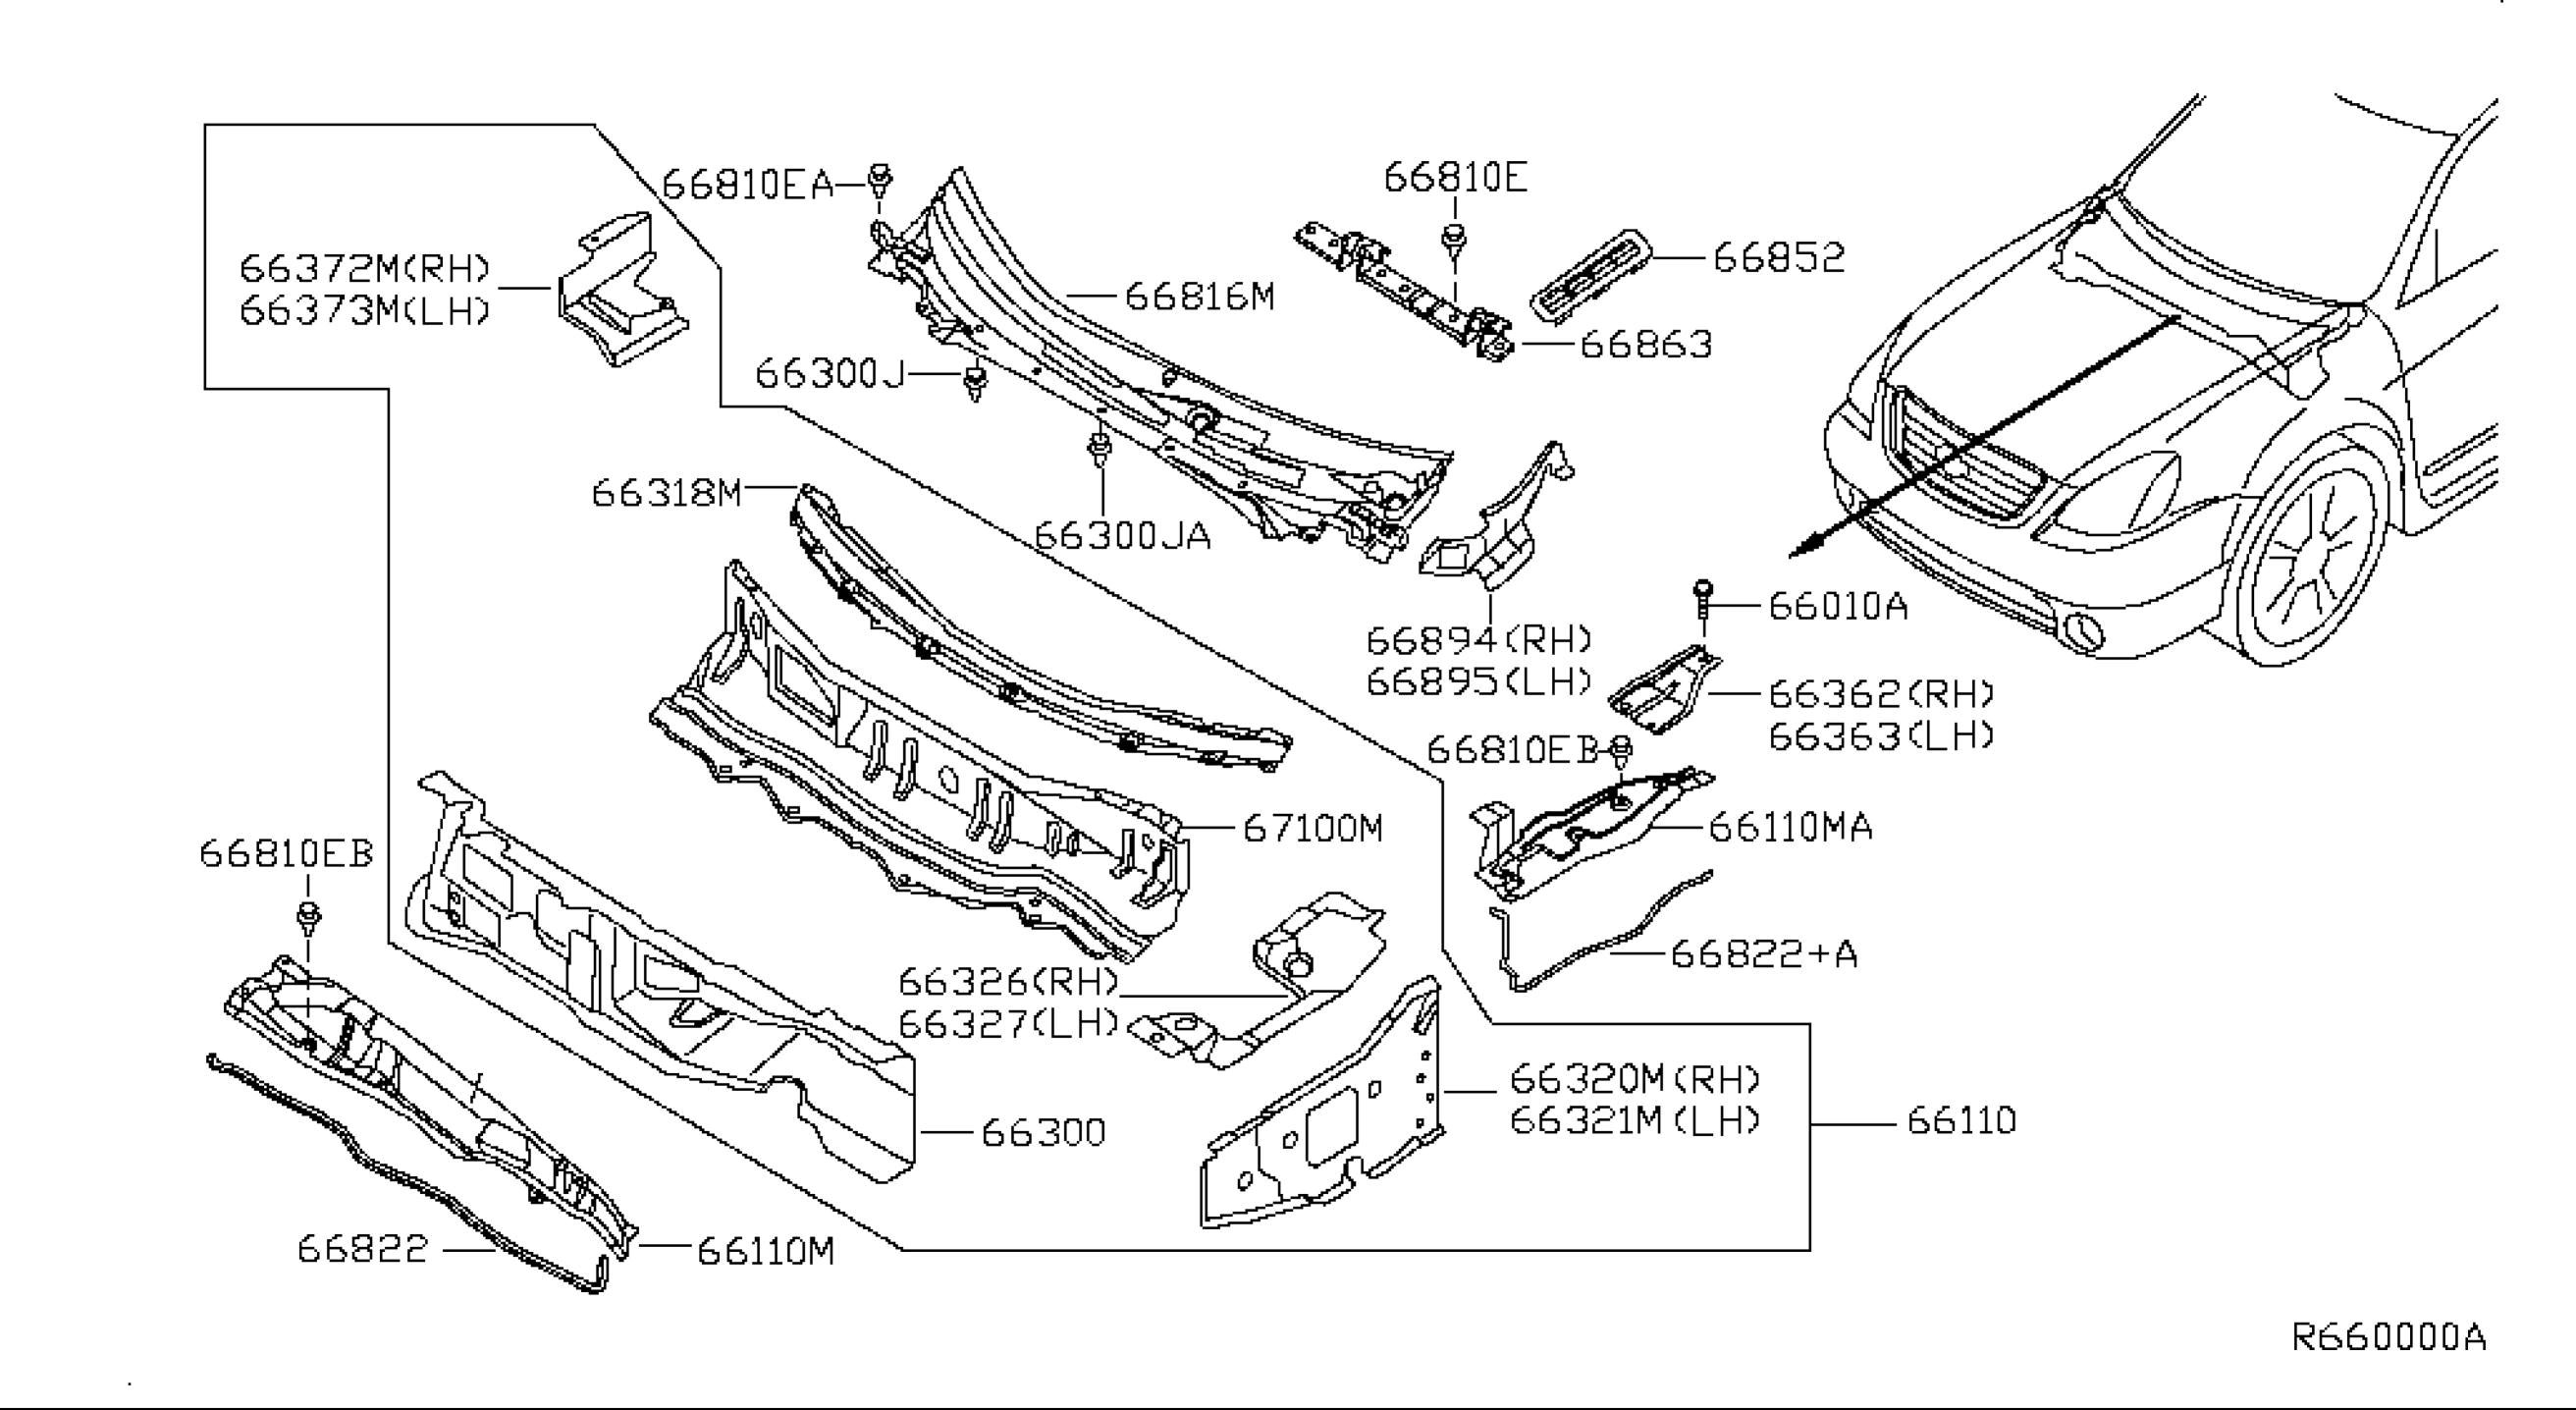 2001 Nissan Maxima Engine Diagram Wire Data Schema Exhaust System Trusted Wiring U2022 Rh Soulmatestyle Co 2006